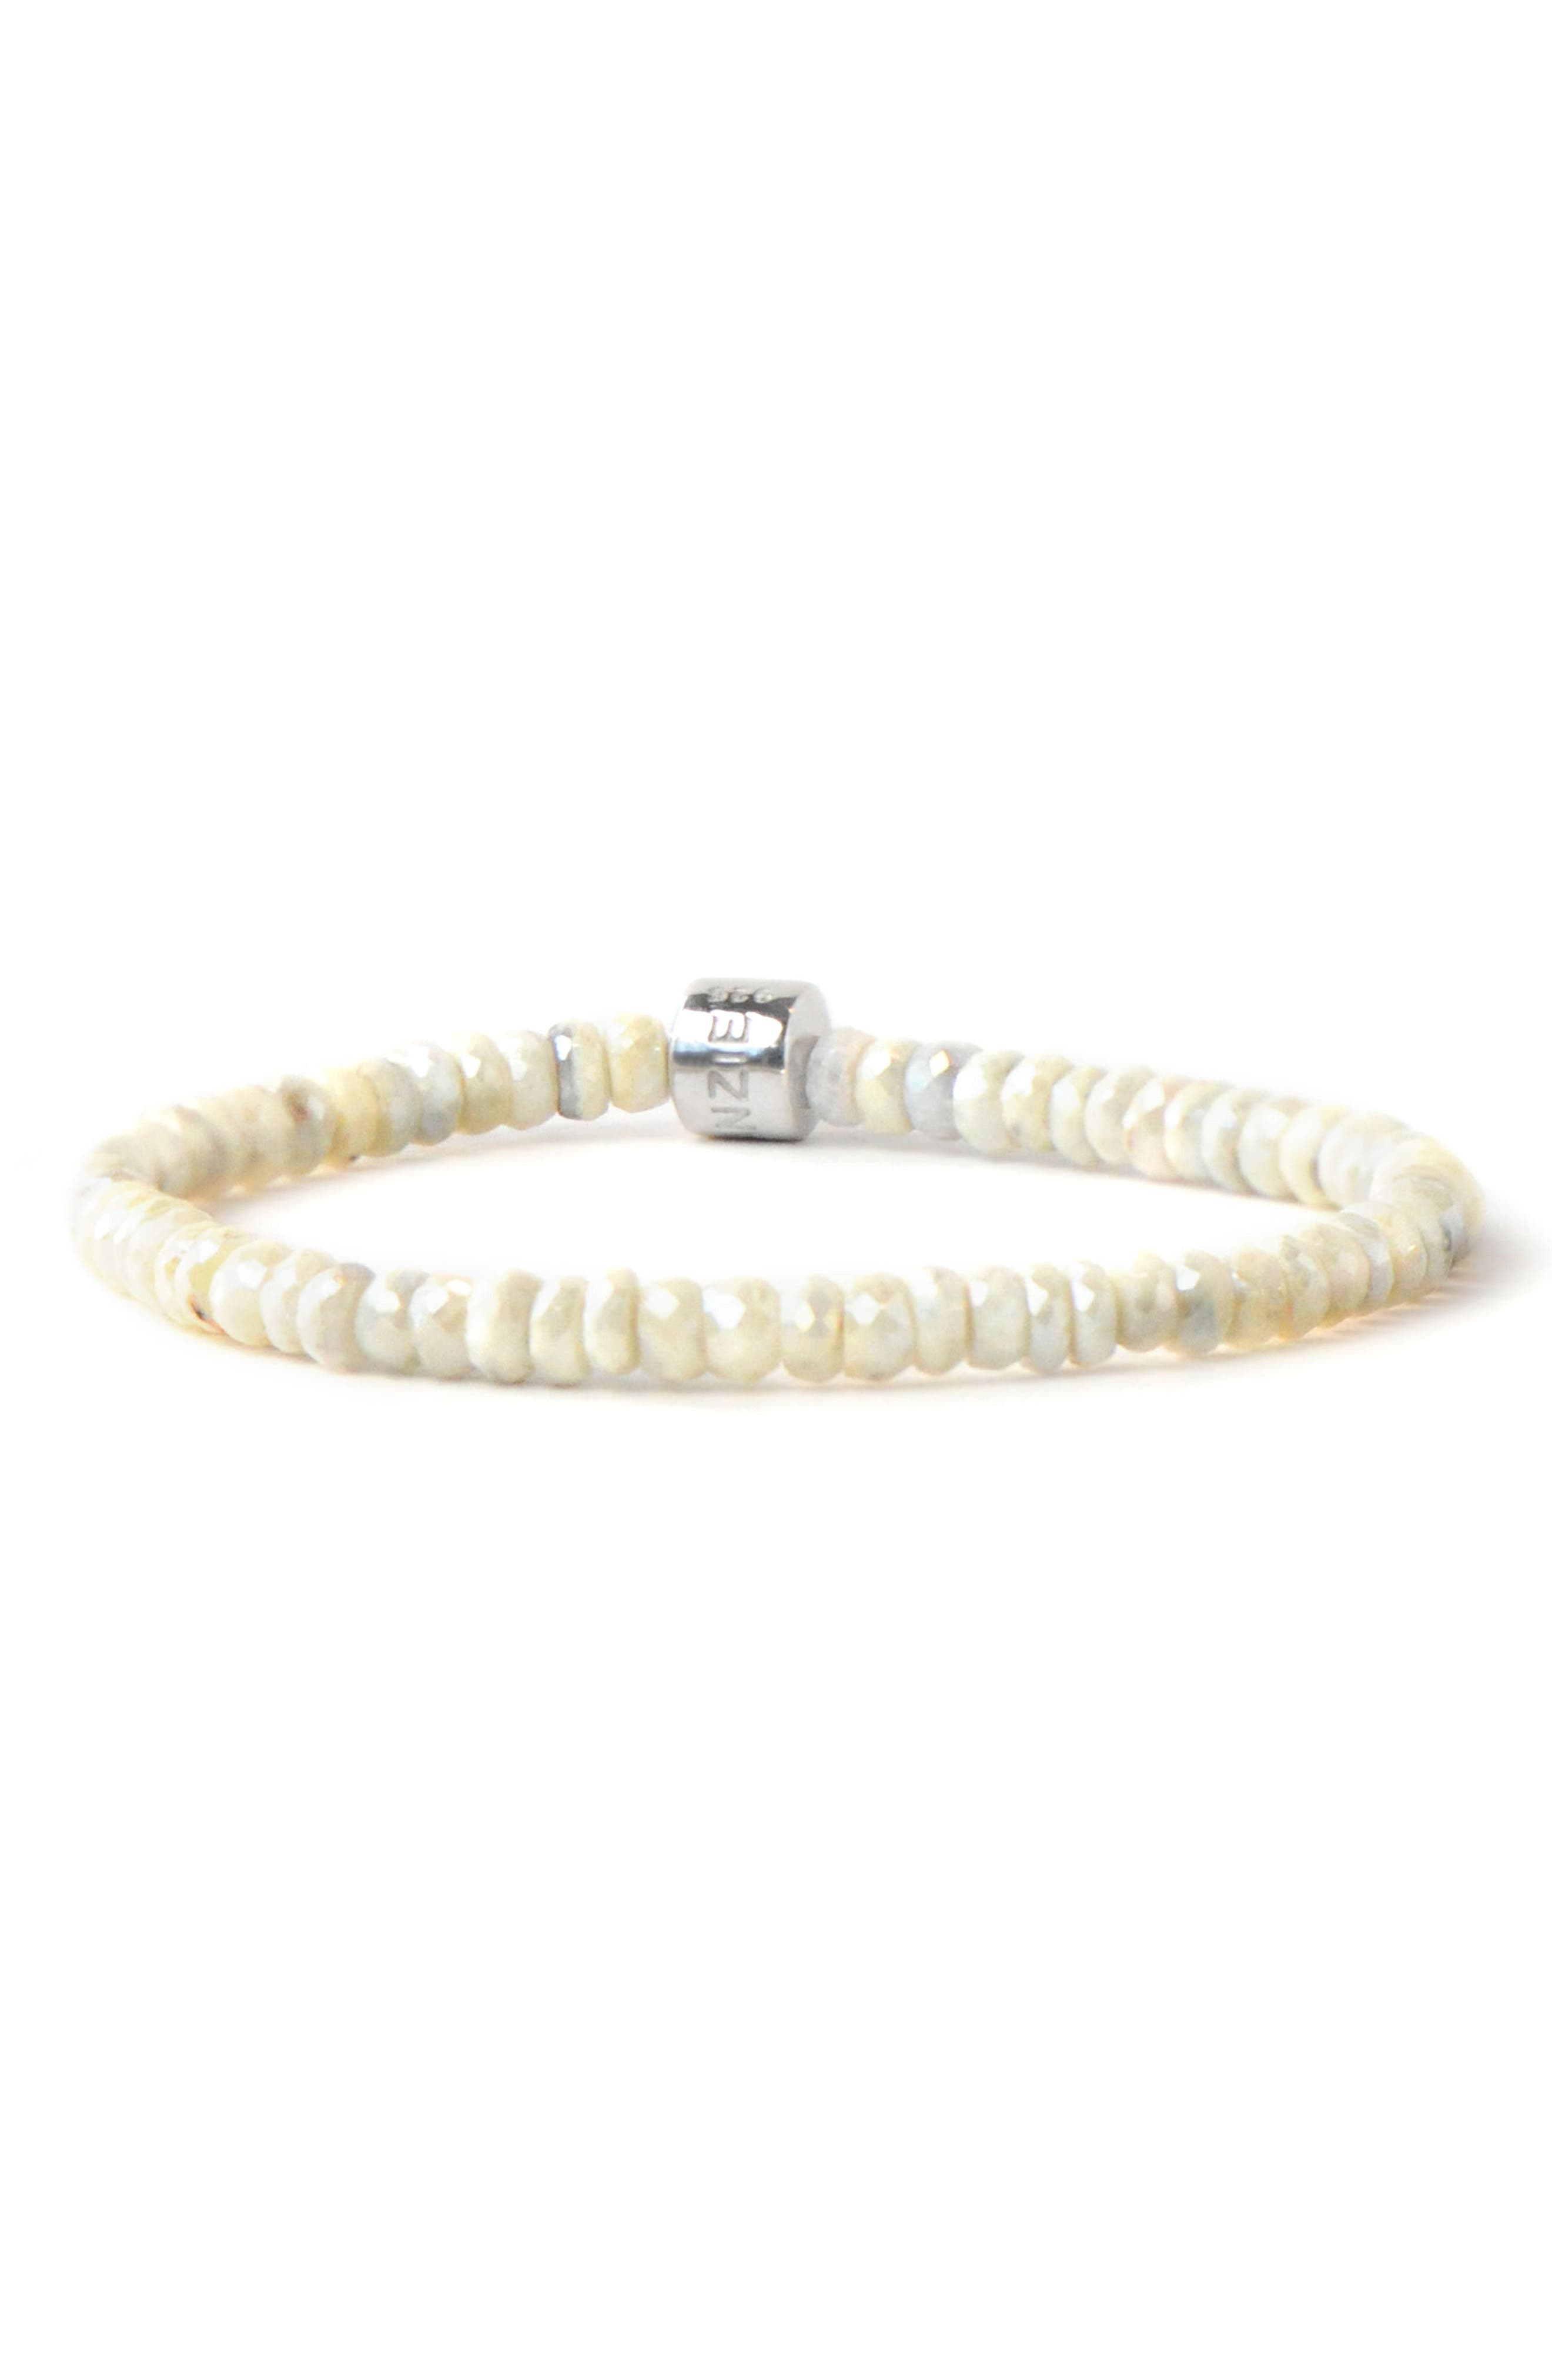 Boheme White Silverite Rondelle Bracelet,                             Main thumbnail 1, color,                             SILVER